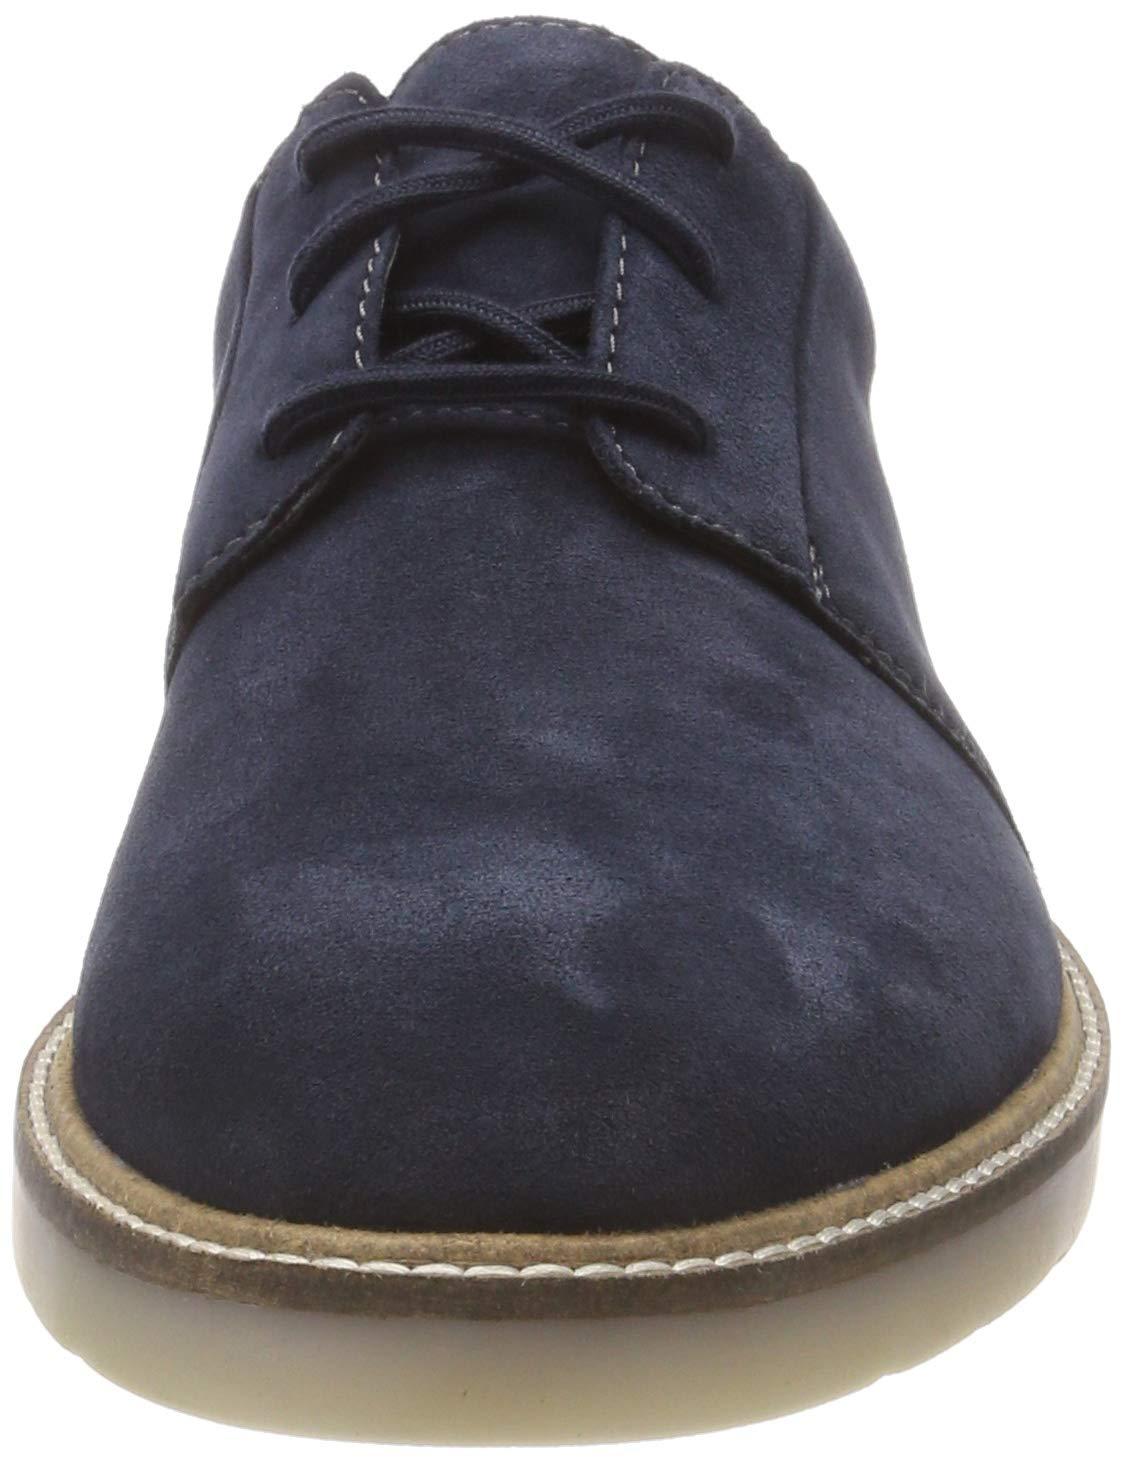 Clarks Grandin Plain, Zapatos de Cordones Brogue Hombre